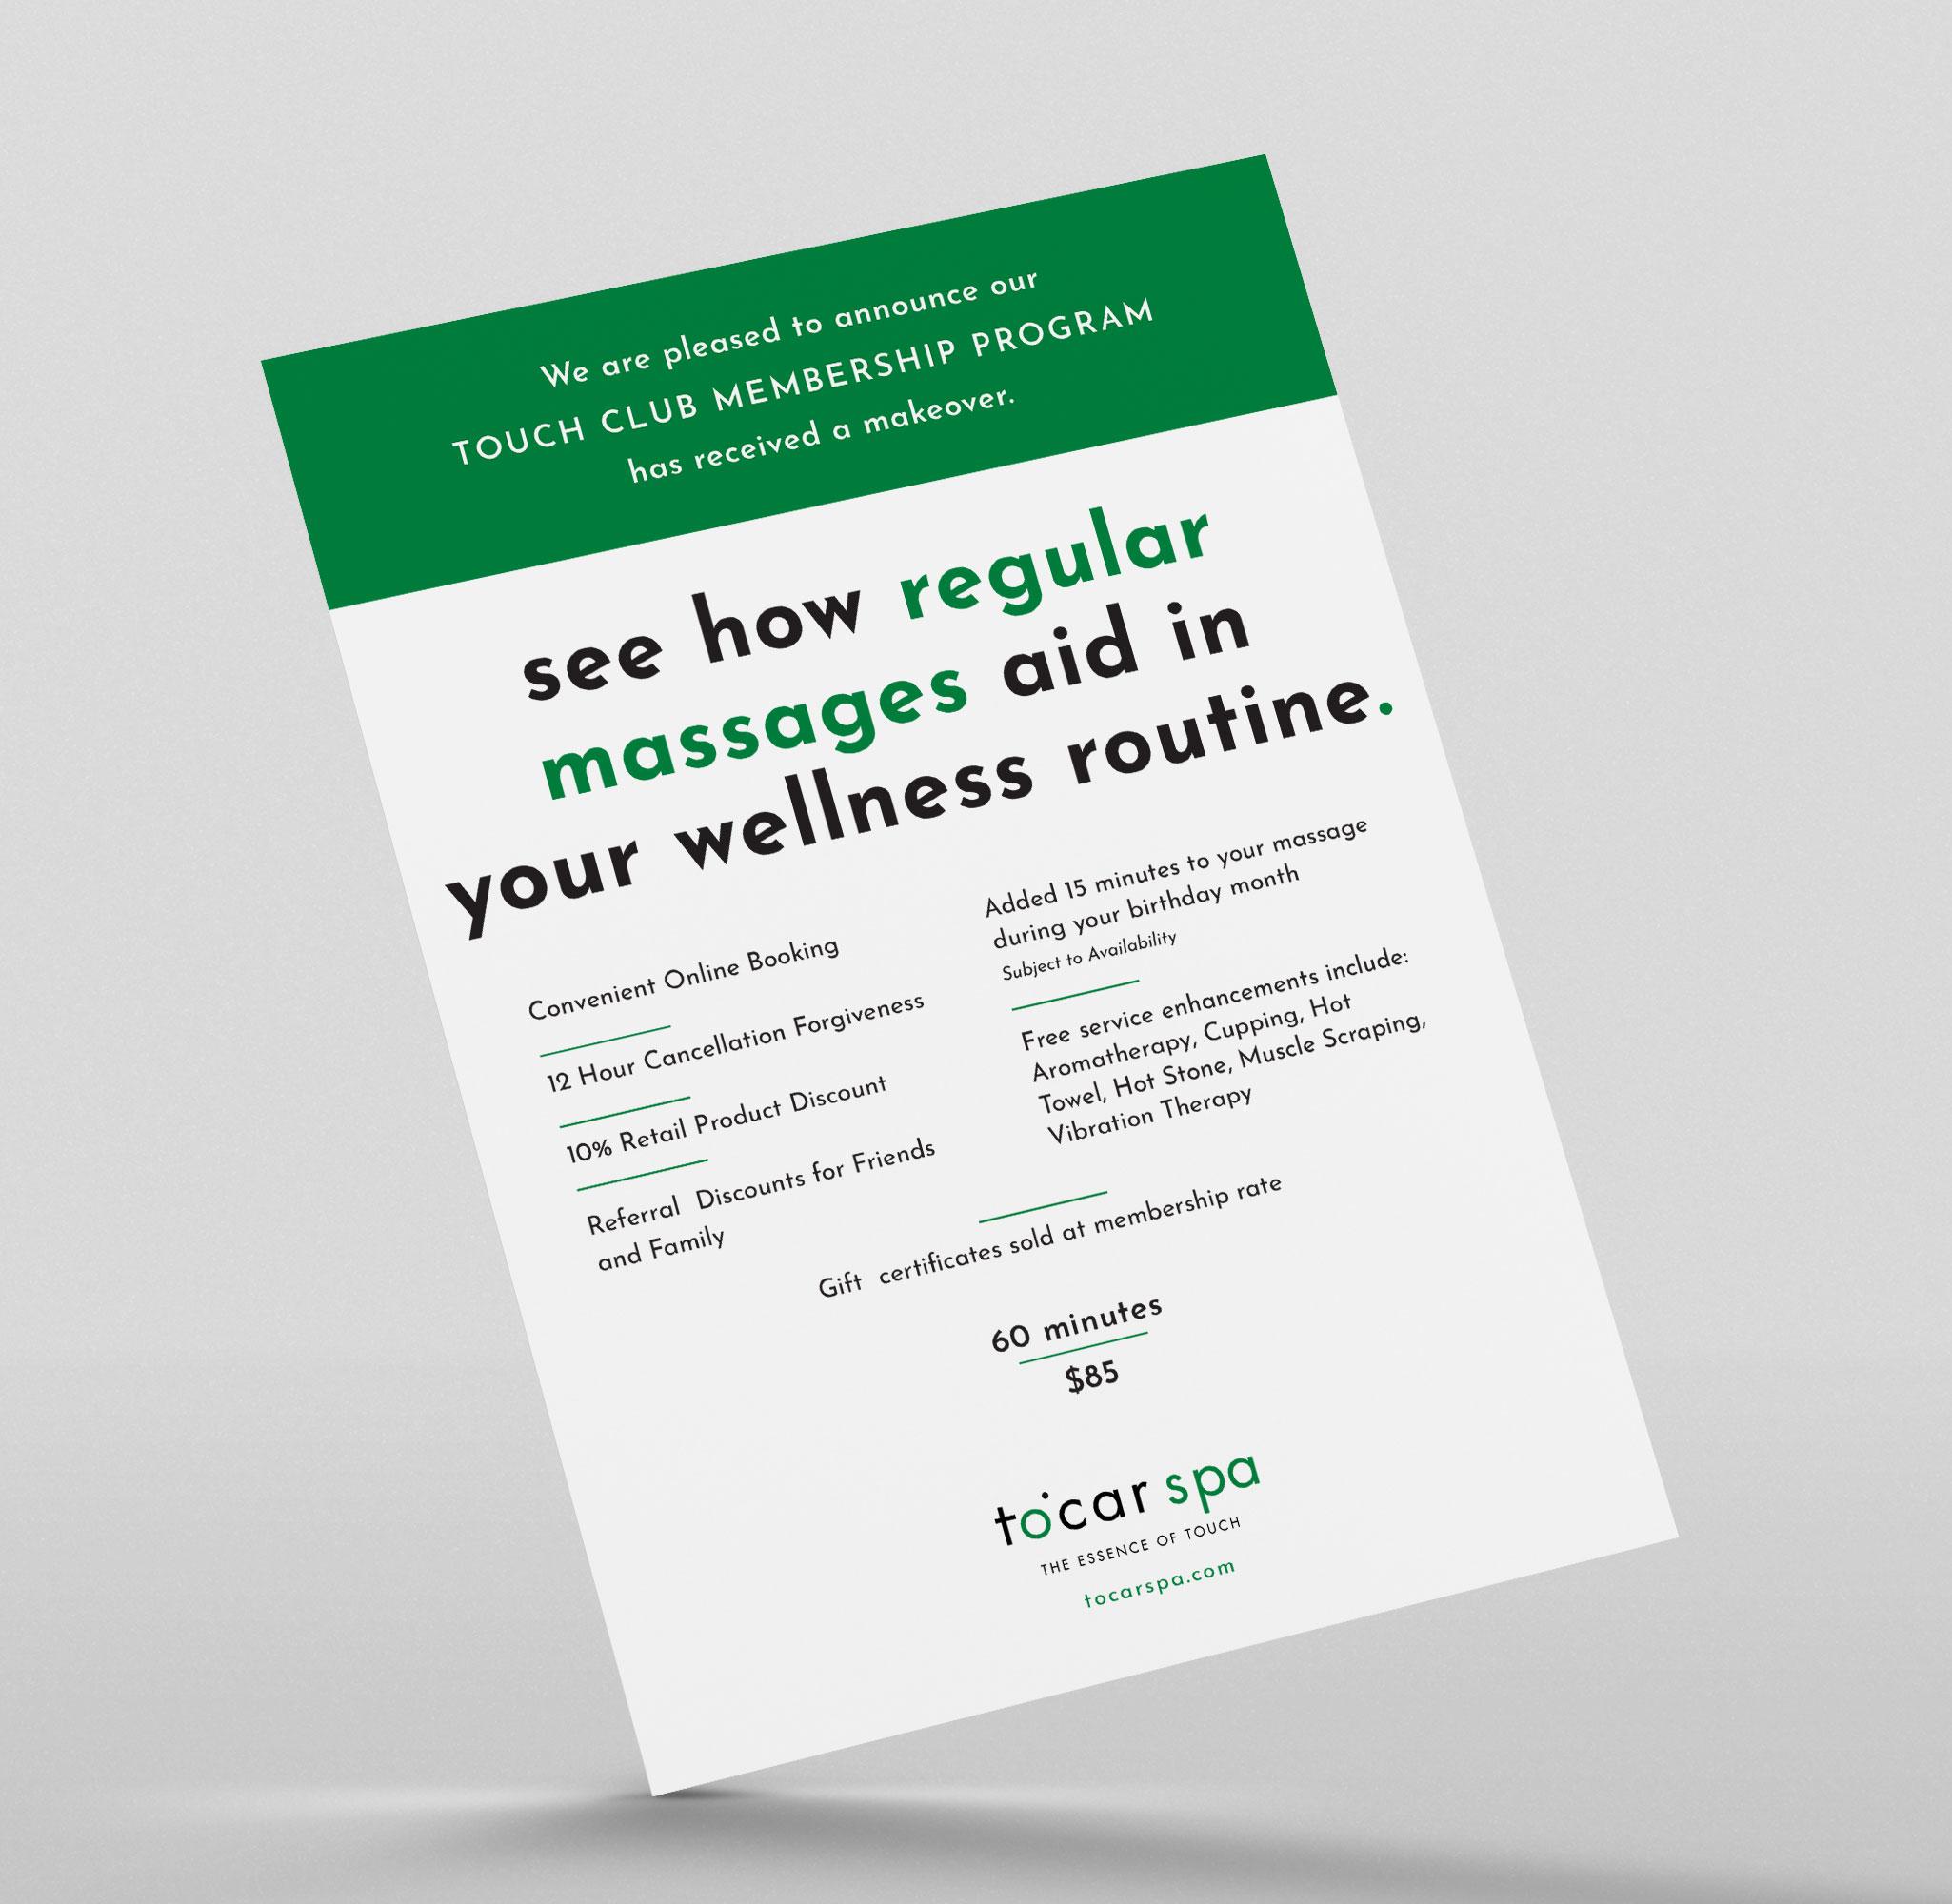 Membership Program flyer designed for Tocar Spa by C&V